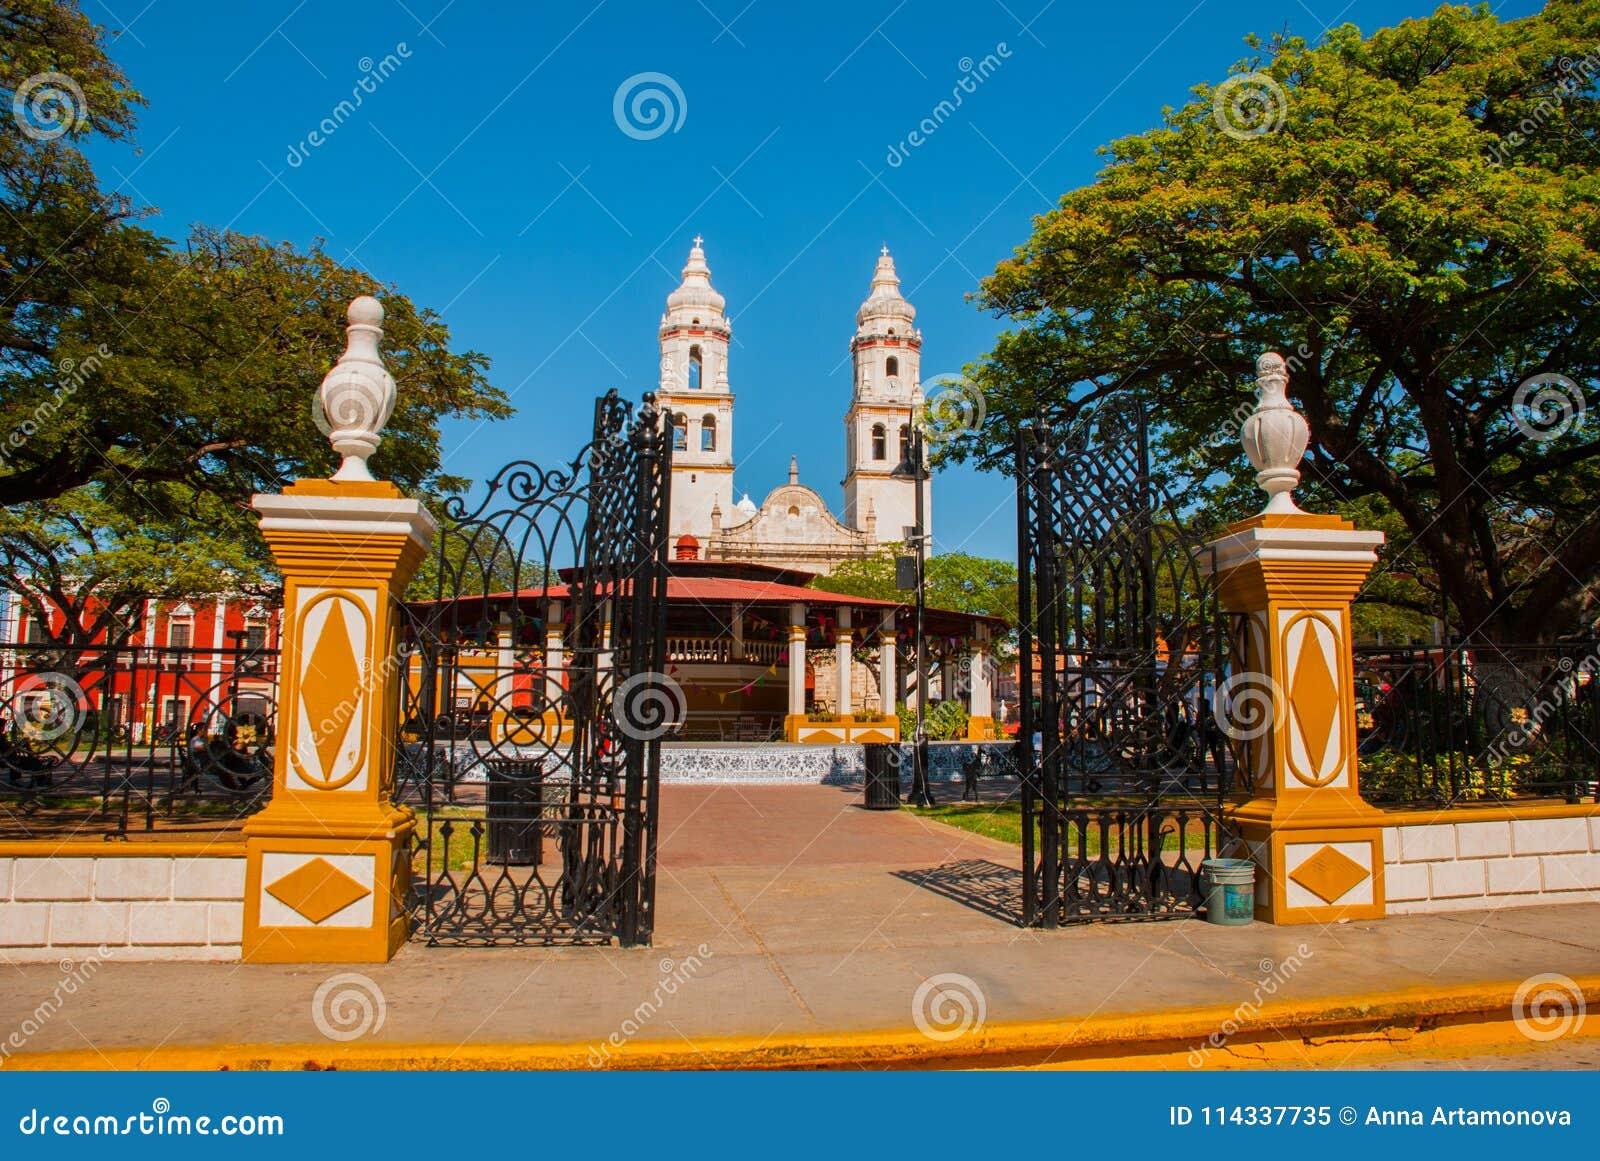 Kathedrale, Campeche, Mexiko: Plaza de la Independencia, in Campeche, Mexiko-` s alte Stadt von San Francisco de Campeche